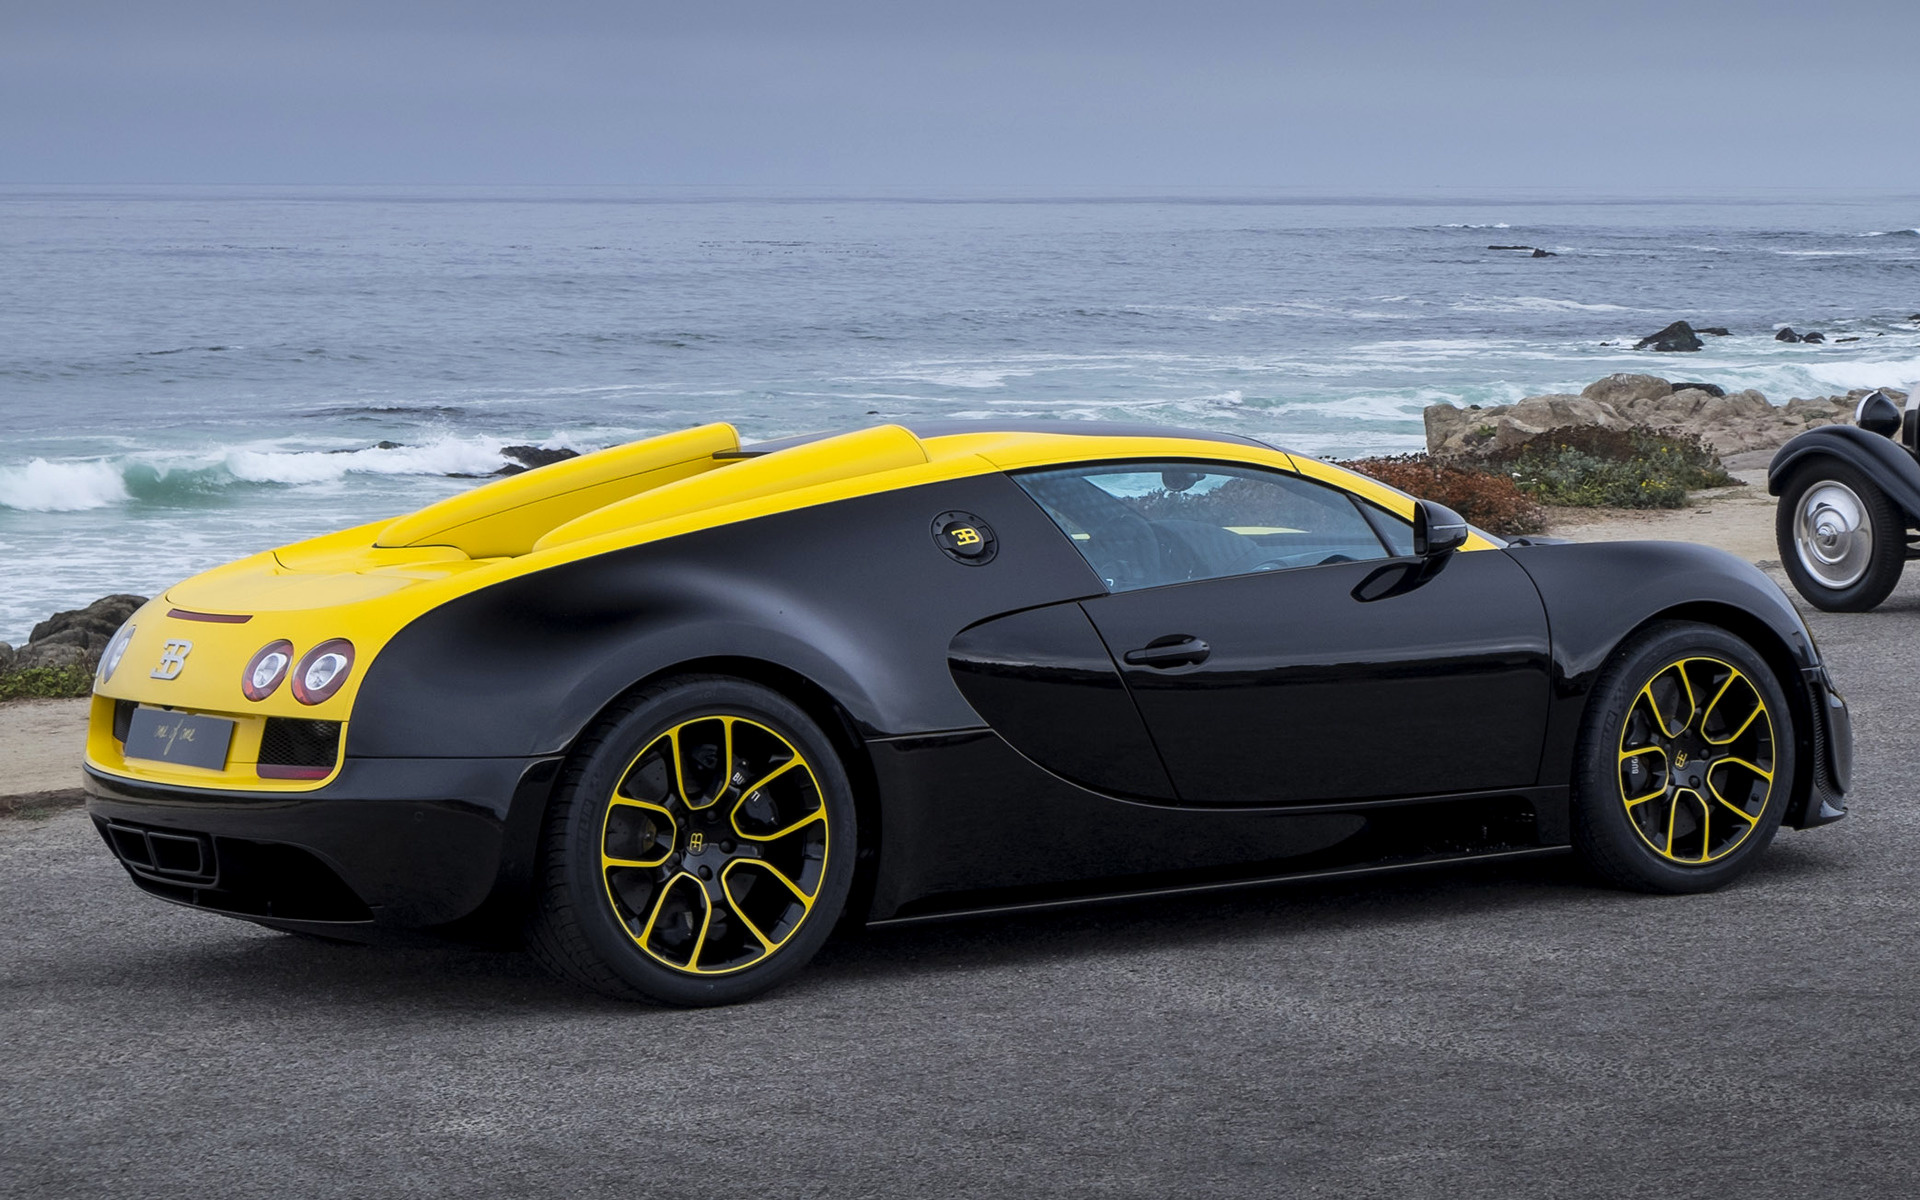 2014 Bugatti Veyron Grand Sport Vitesse 1 Of 1